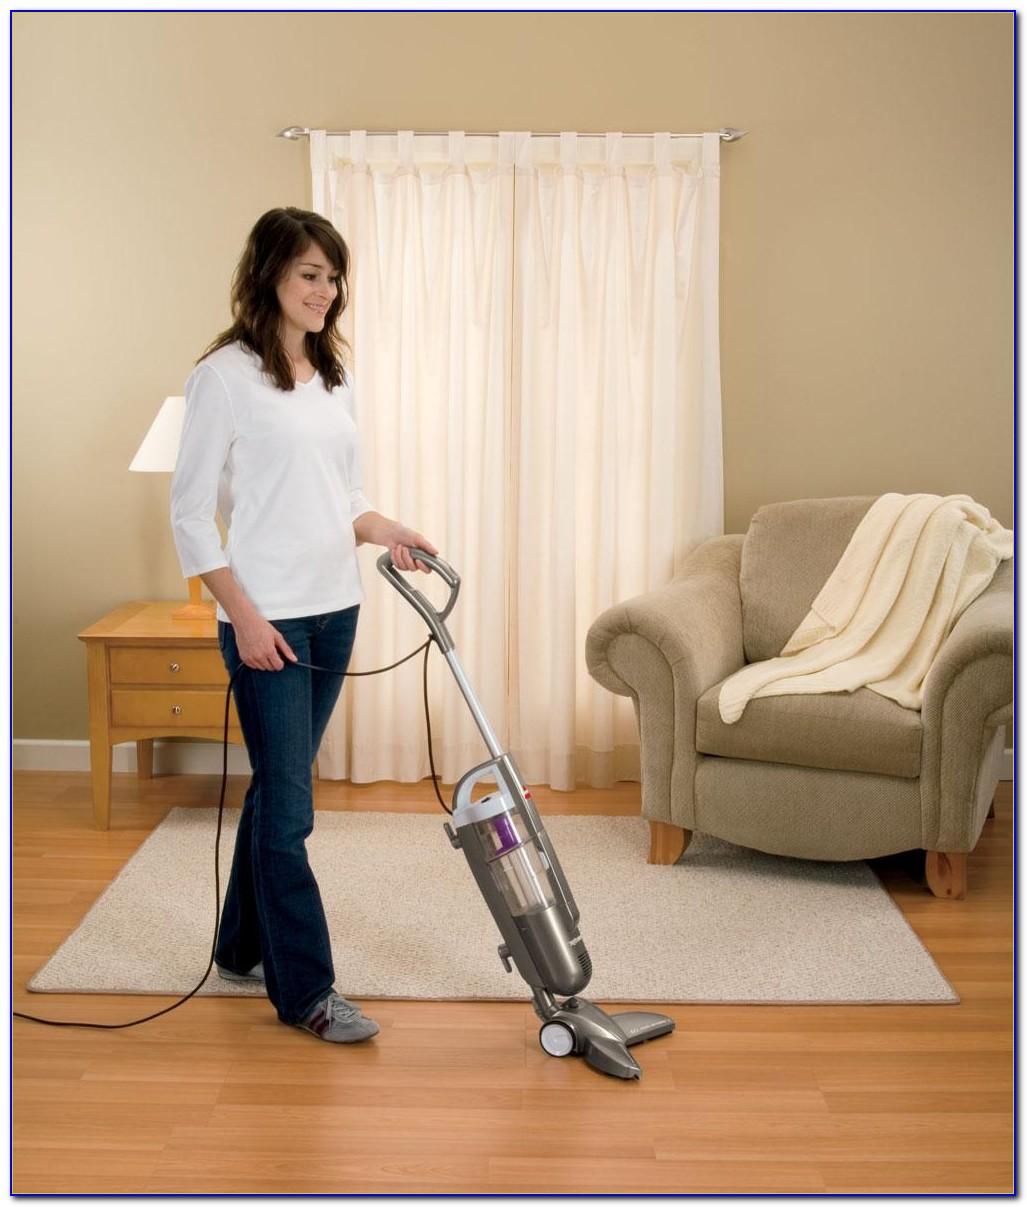 Best Lightweight Vacuum For Hardwood Floors And Carpet